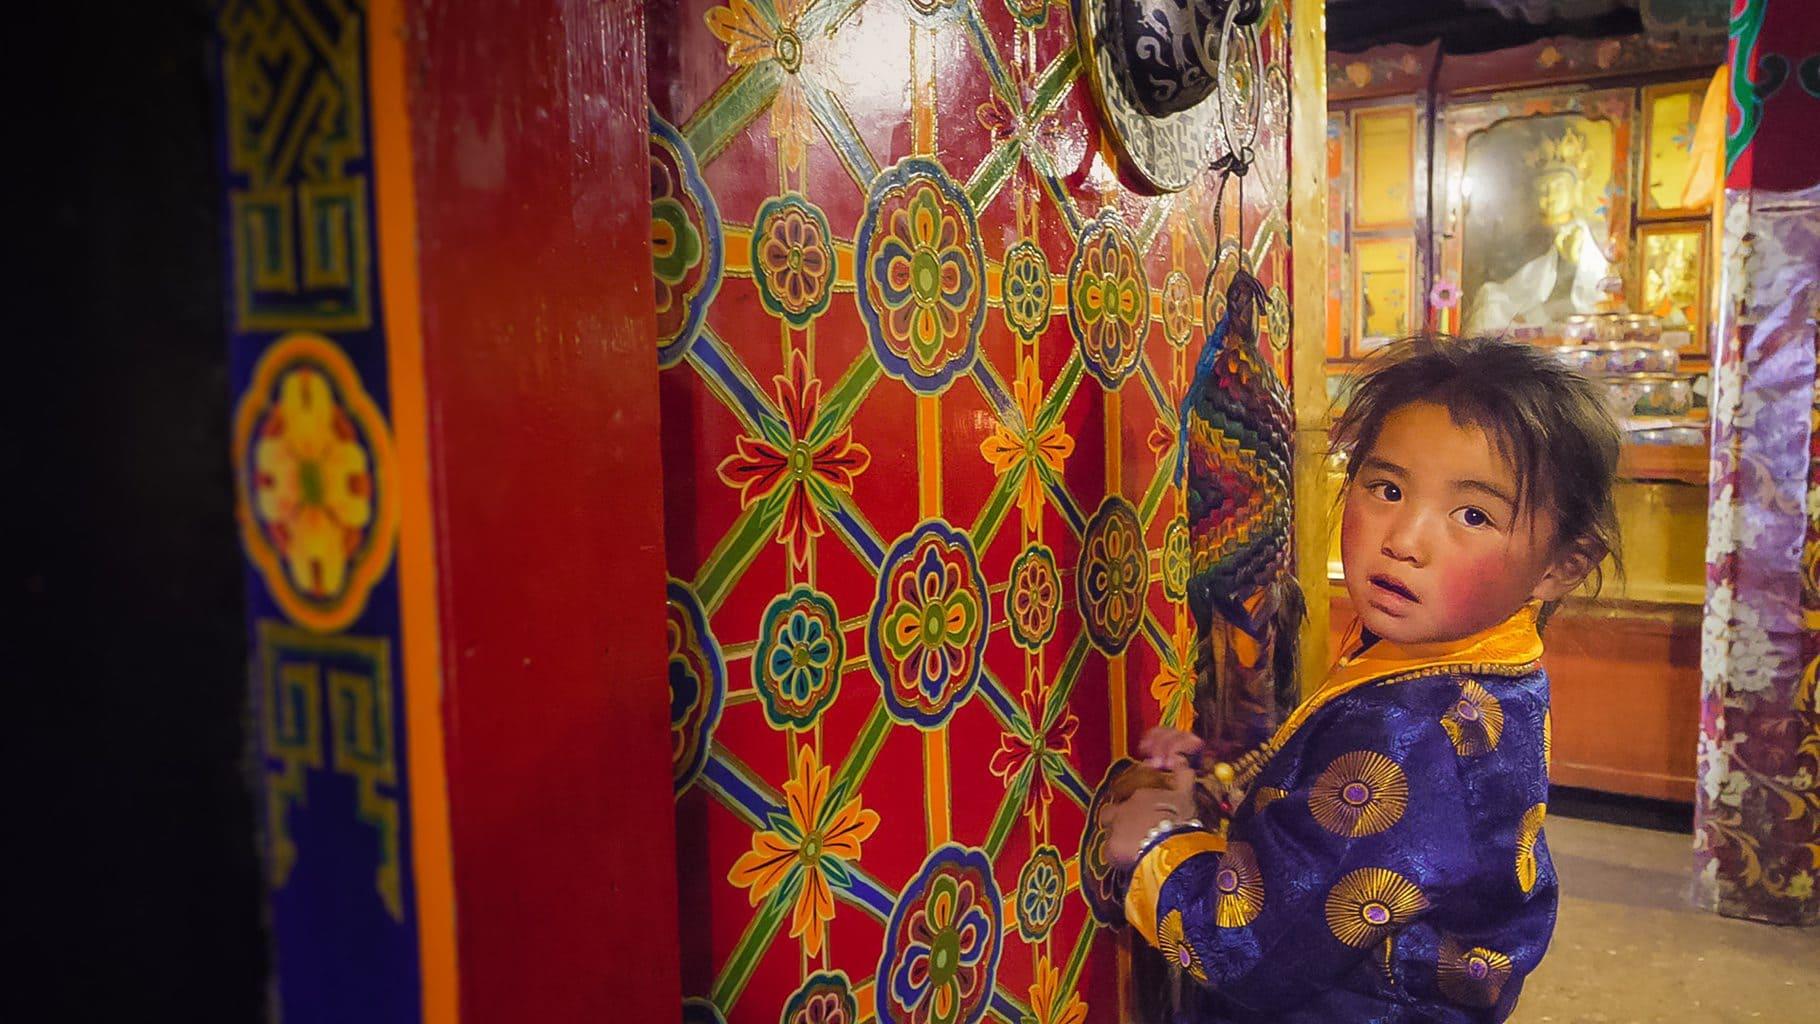 Tibetan girl at Jokhang Temple